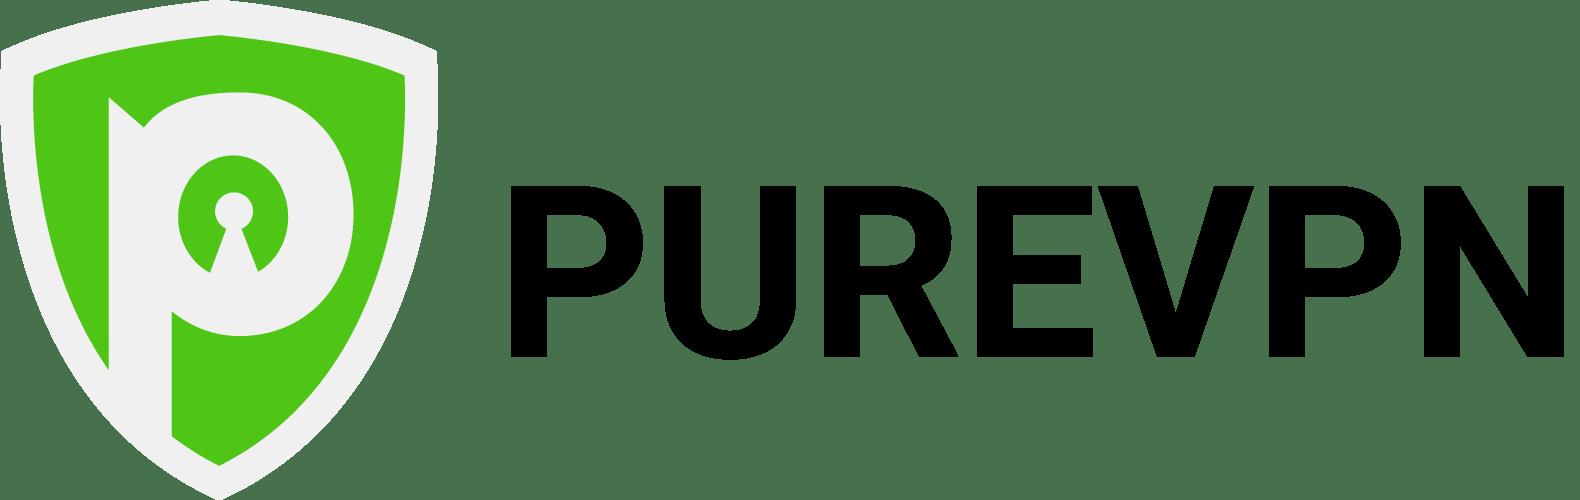 purevpn-logo-flat-3288253-6055319